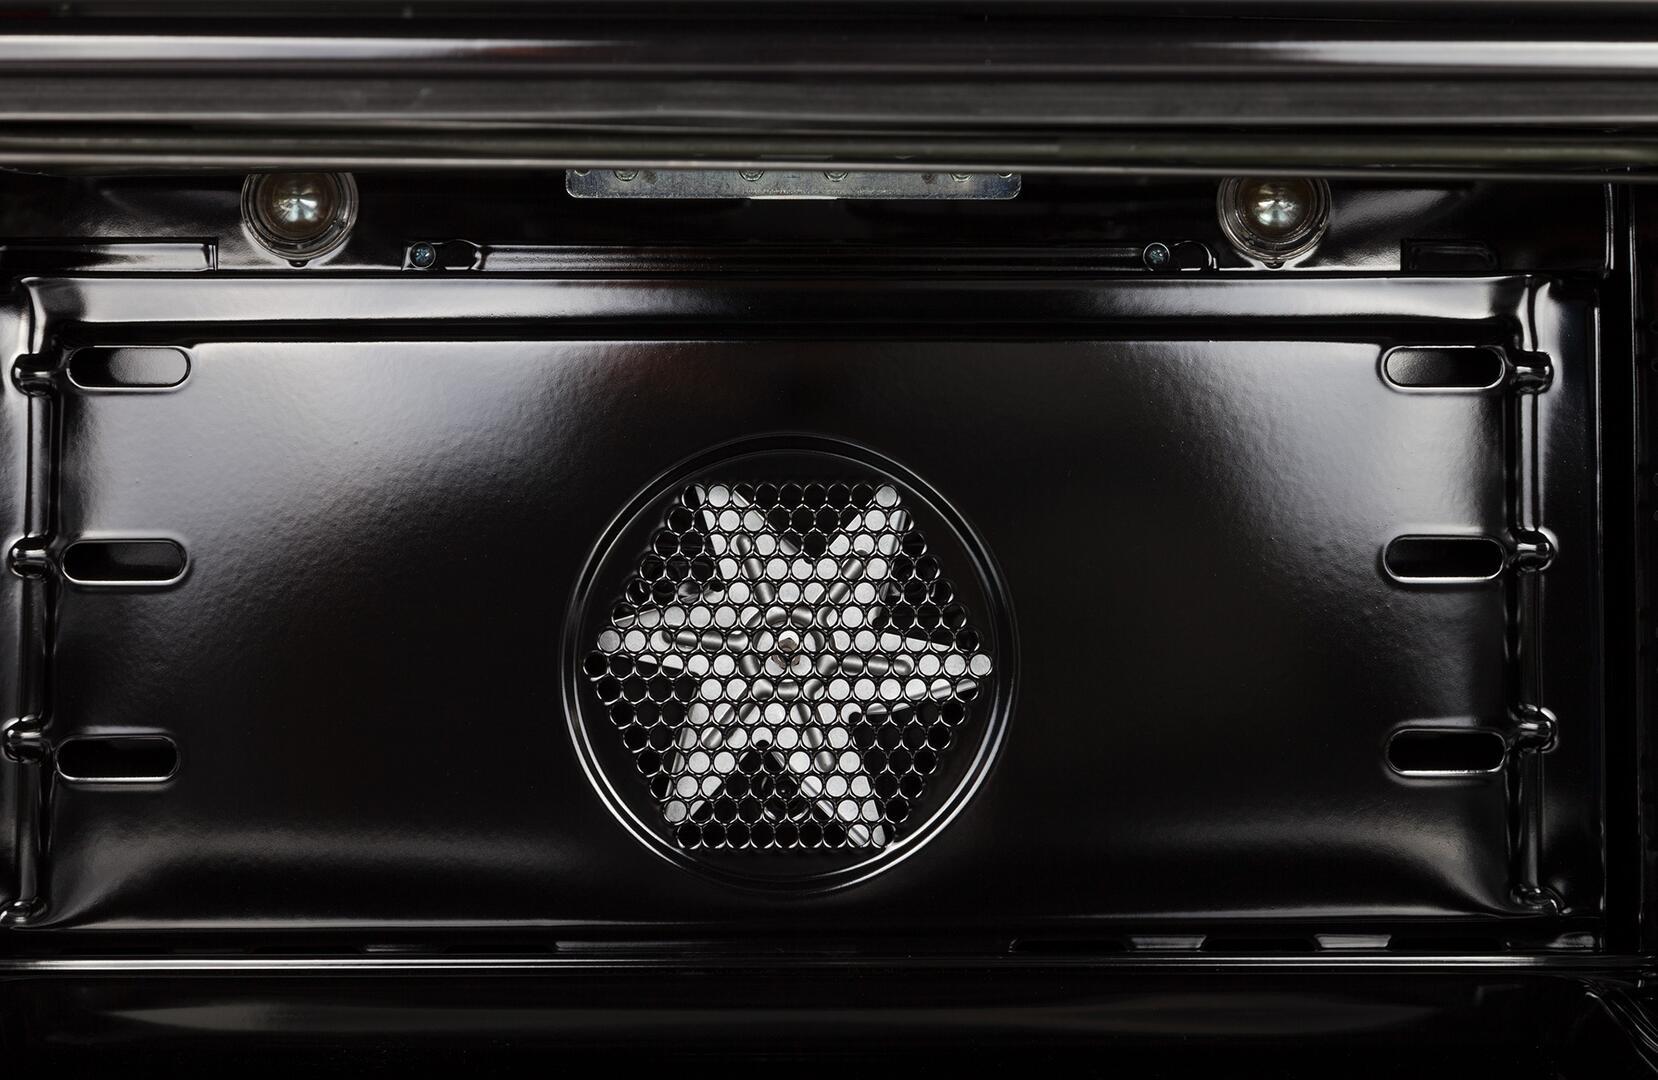 Ilve Nostalgie UPN90FDMPBL Freestanding Dual Fuel Range Blue, Oven Interior View